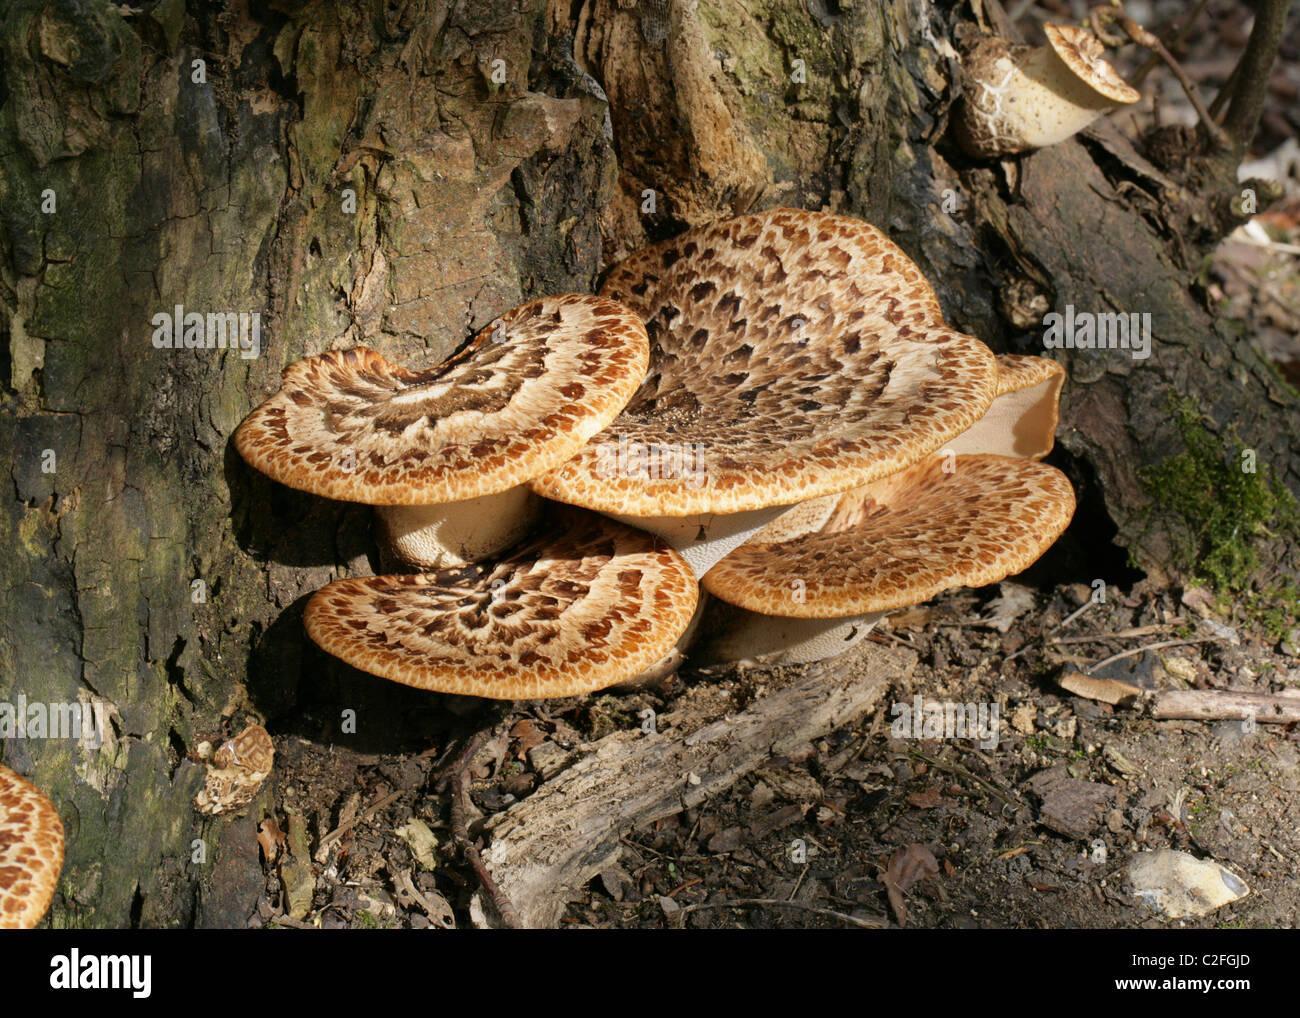 Dryad's Saddle or Scaly Polypore, Polyporus squamosus, Polyporaceae. Bracket Fungus. Fruiting Bodies. - Stock Image